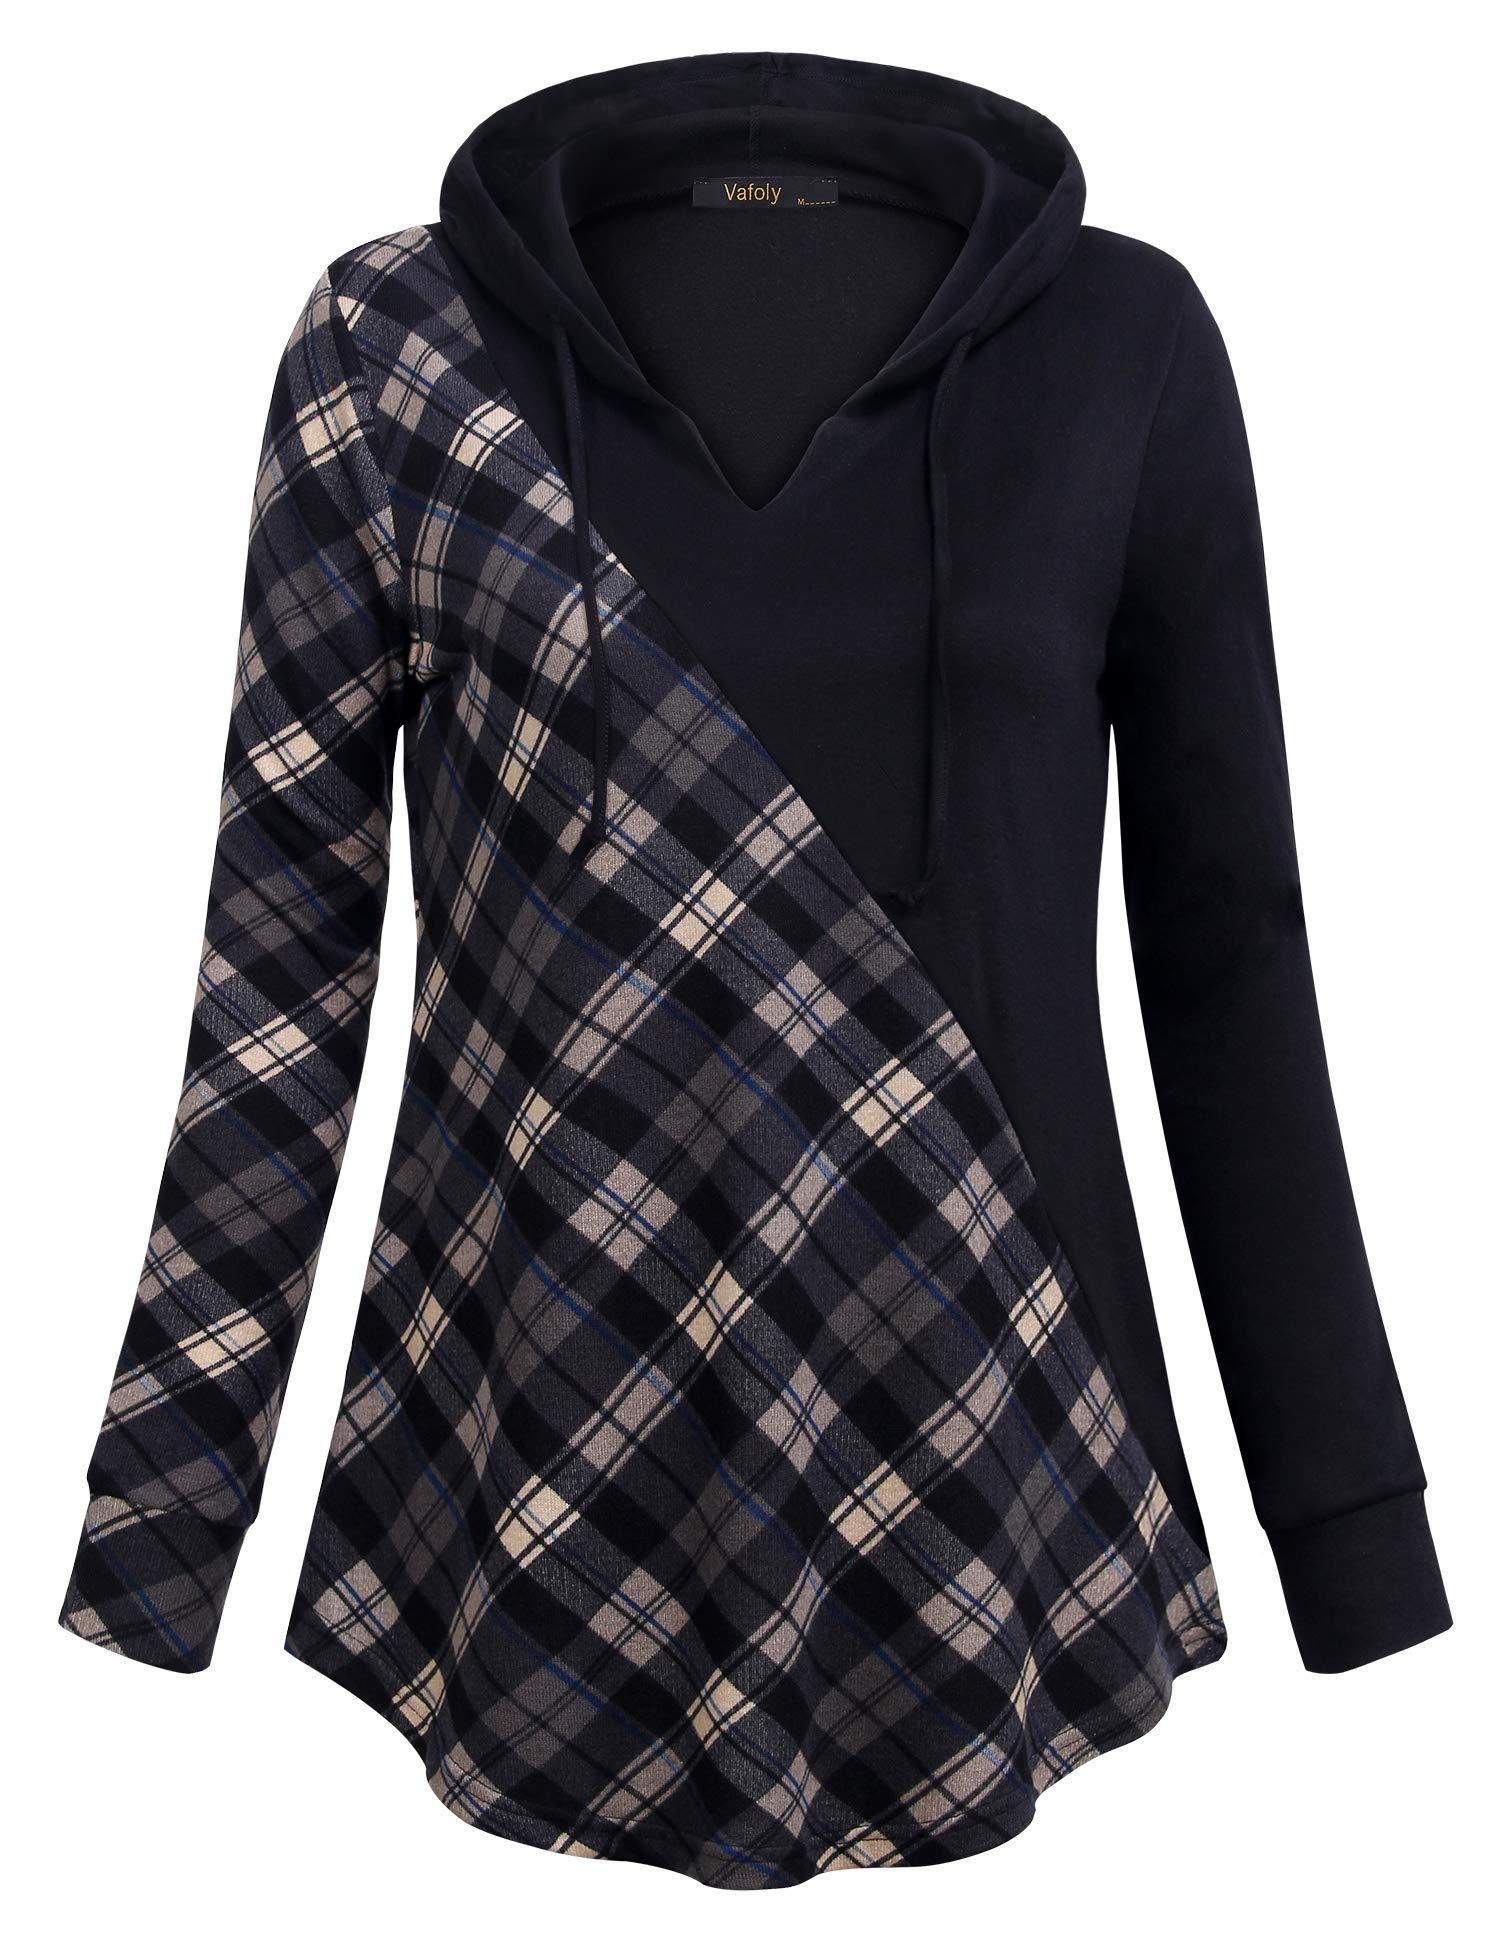 Vafoly Lightweight Pullover Women, Warm Tunics for Women Hooded for School, Sweatshirt Contrast Plus Size Plaid Tunic Tops Deep Grey M